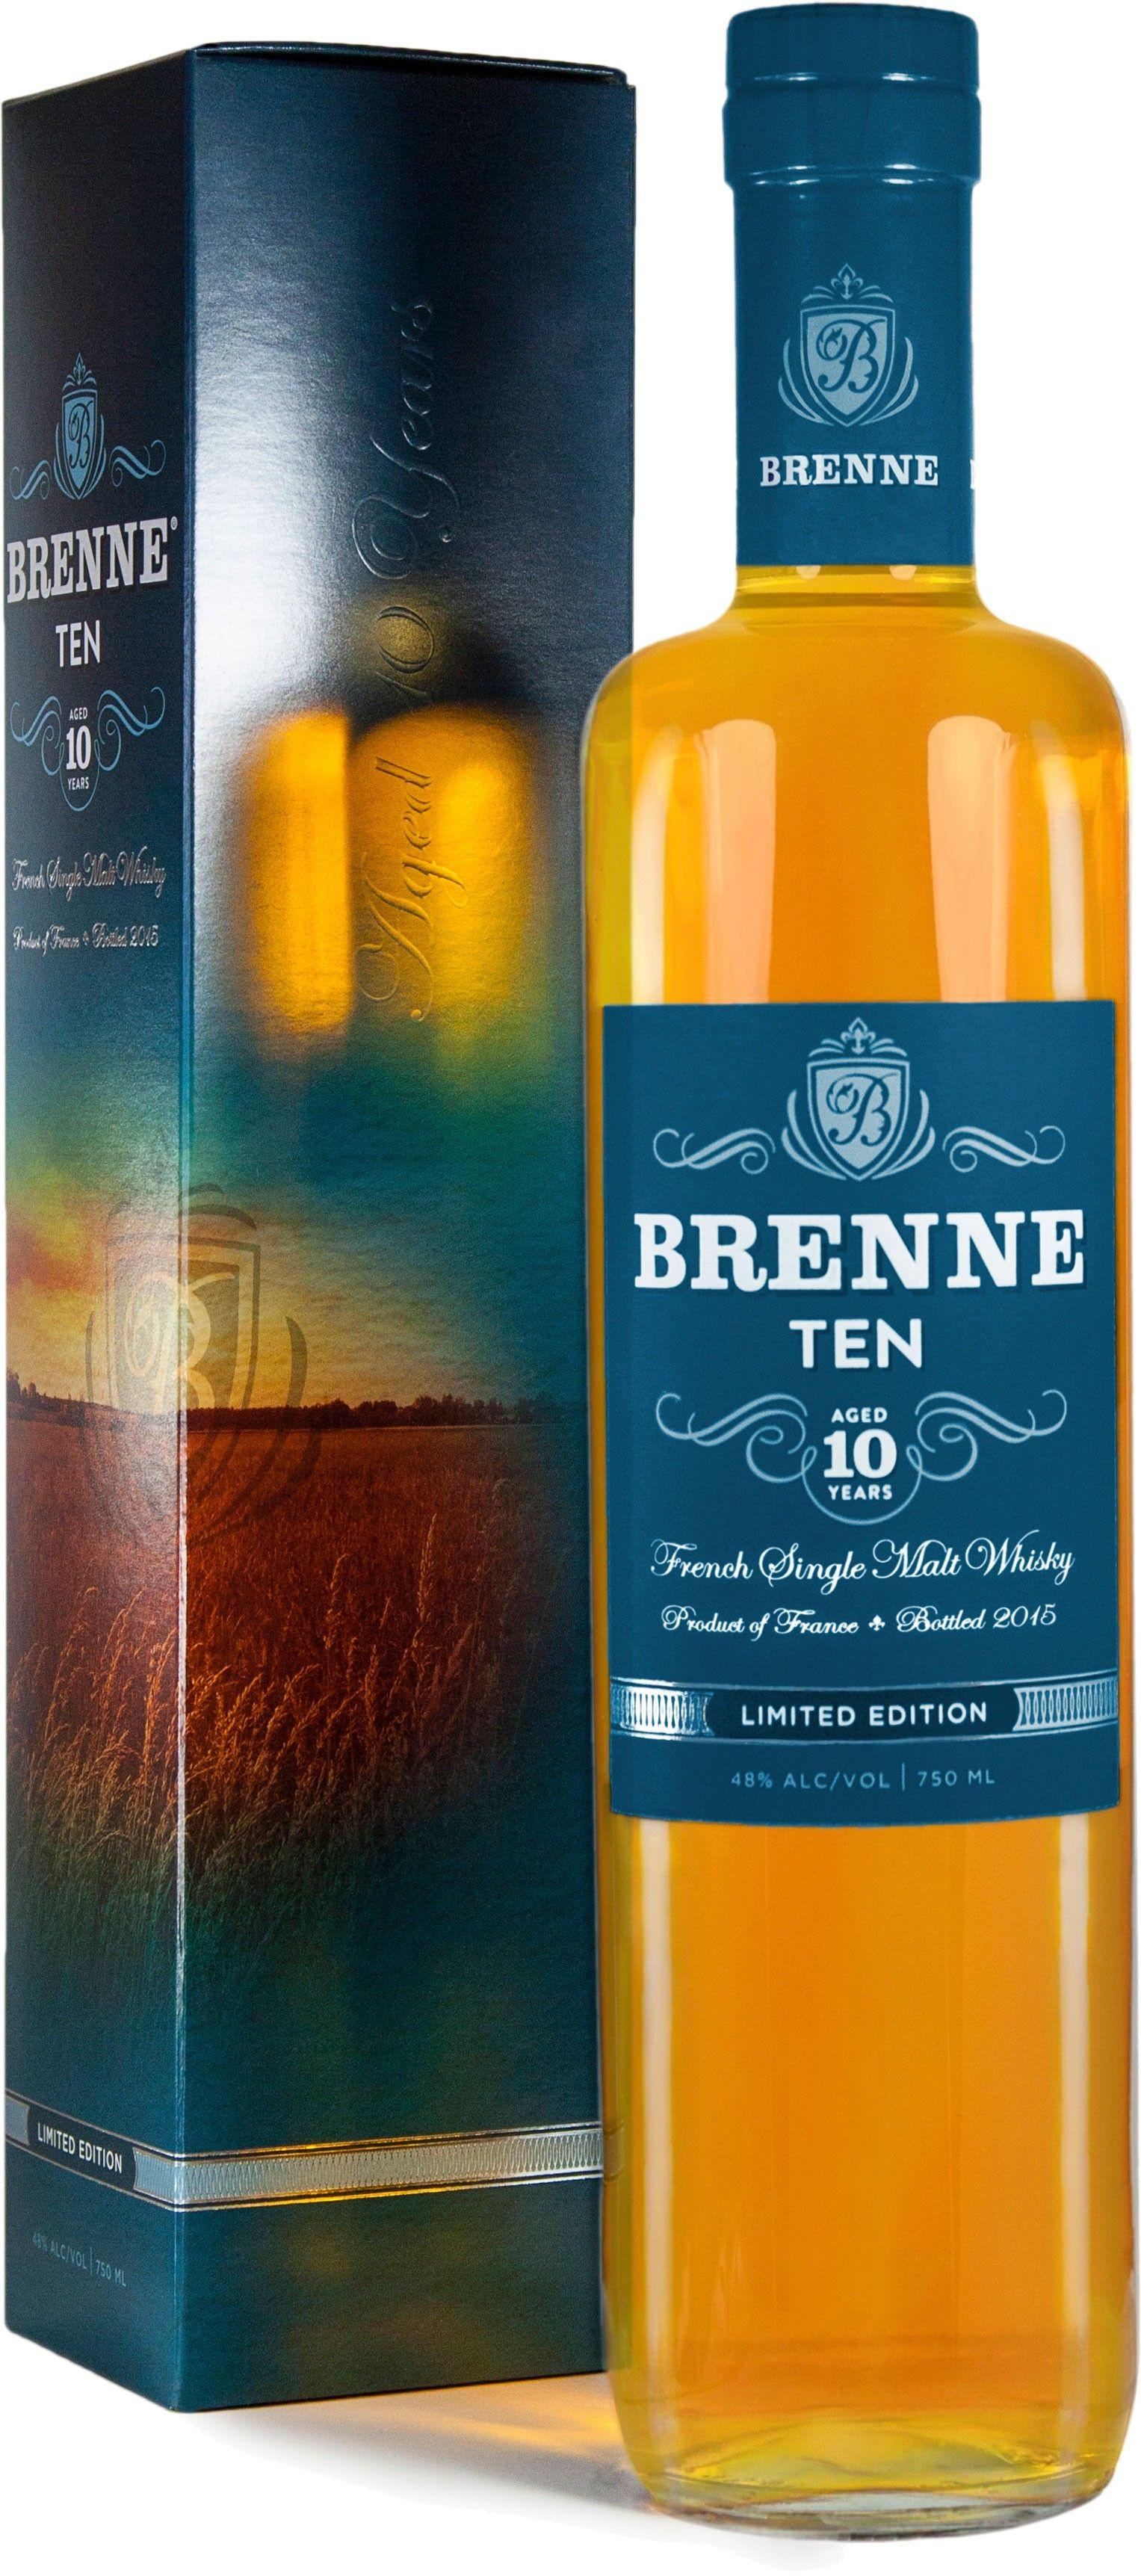 Brenne 10 Year Old French Single Malt Whisky Malt Whisky Single Malt Single Malt Whisky